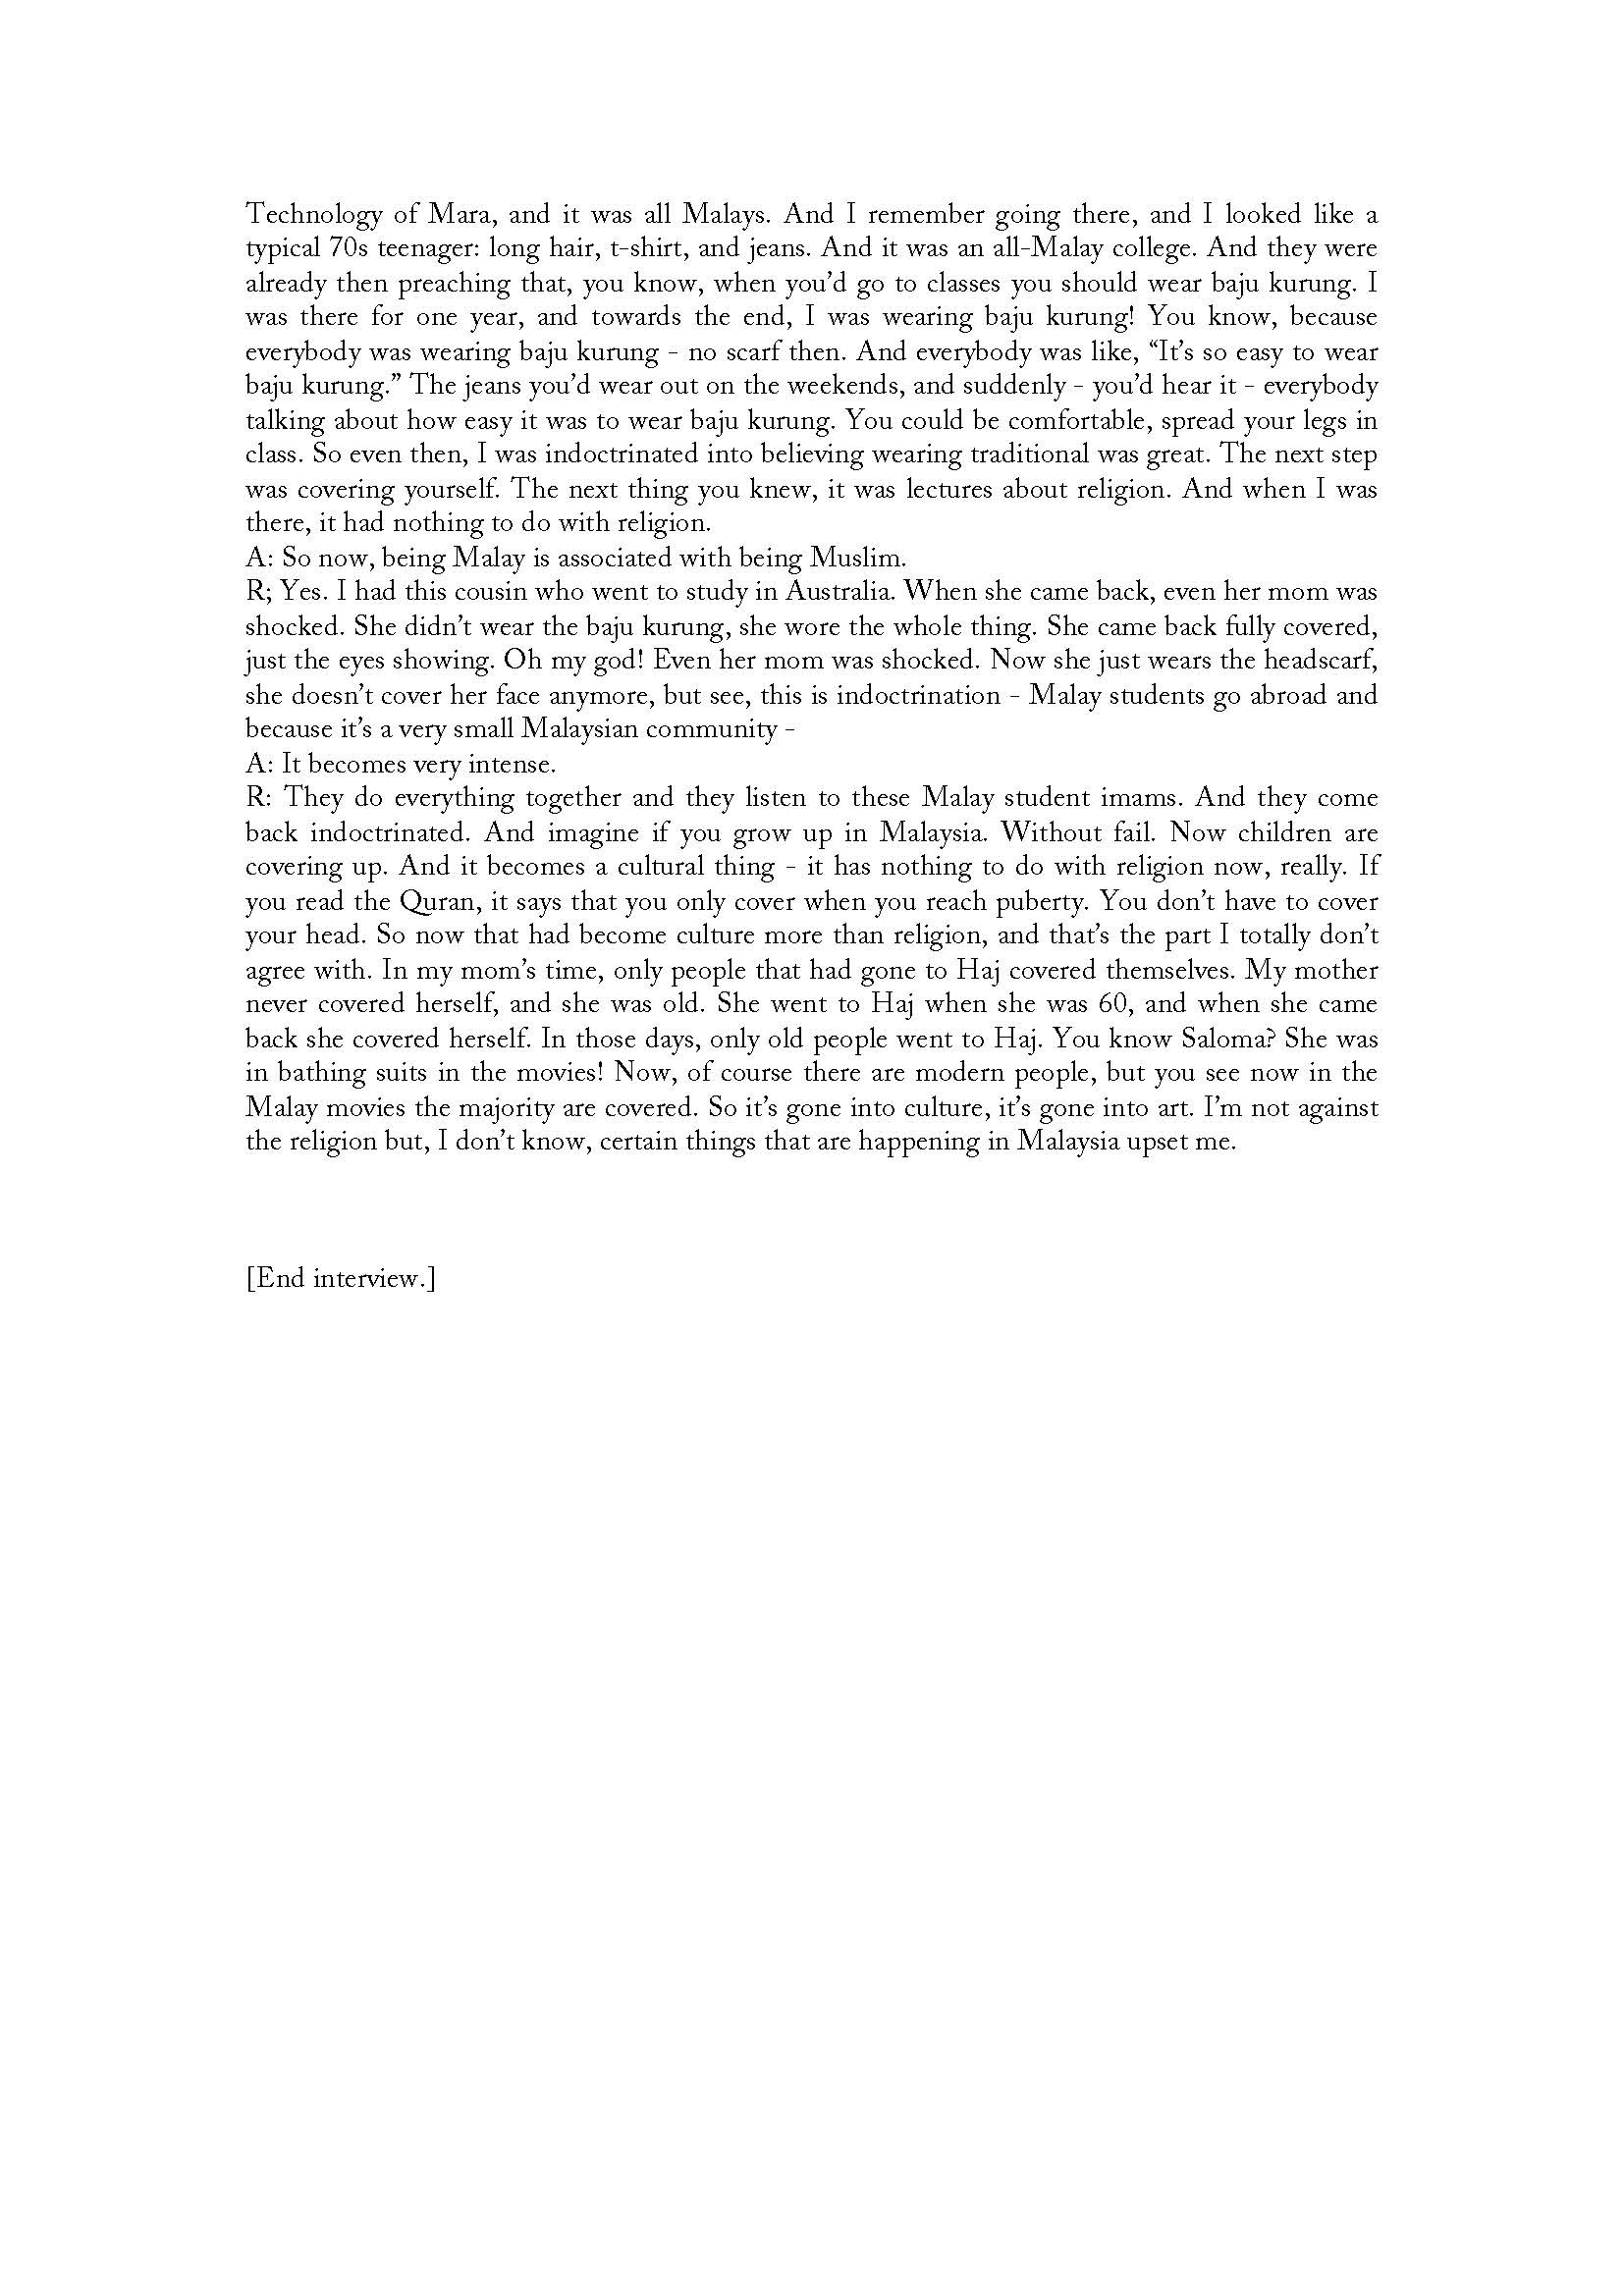 dissertationAppendix_Page_11-min_1654